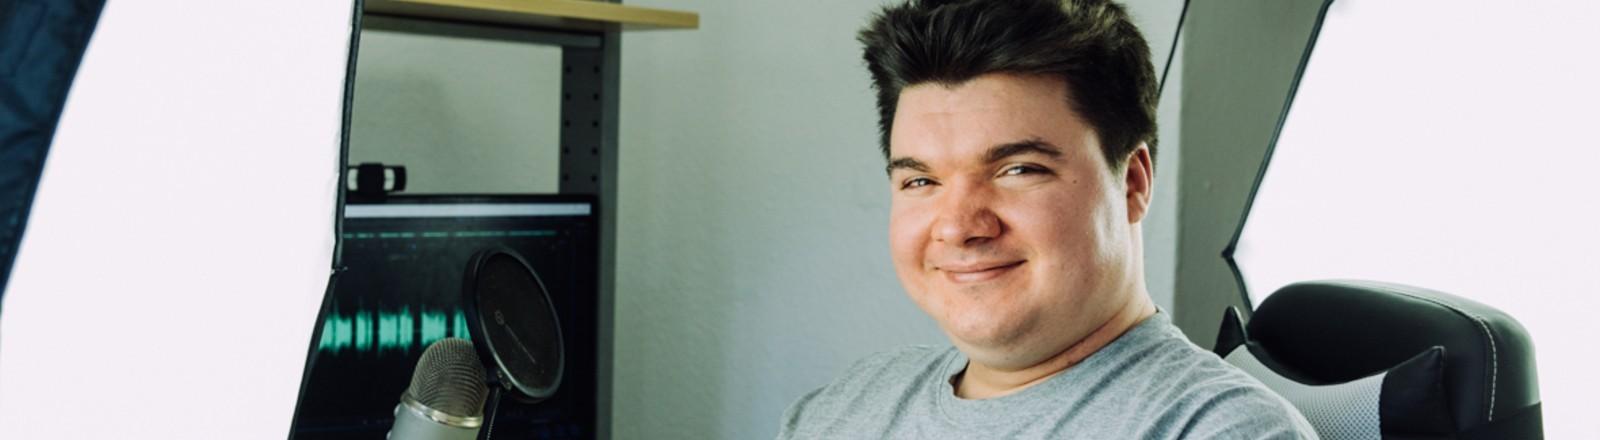 Lukas Krämer in seinem Youtube-Studio